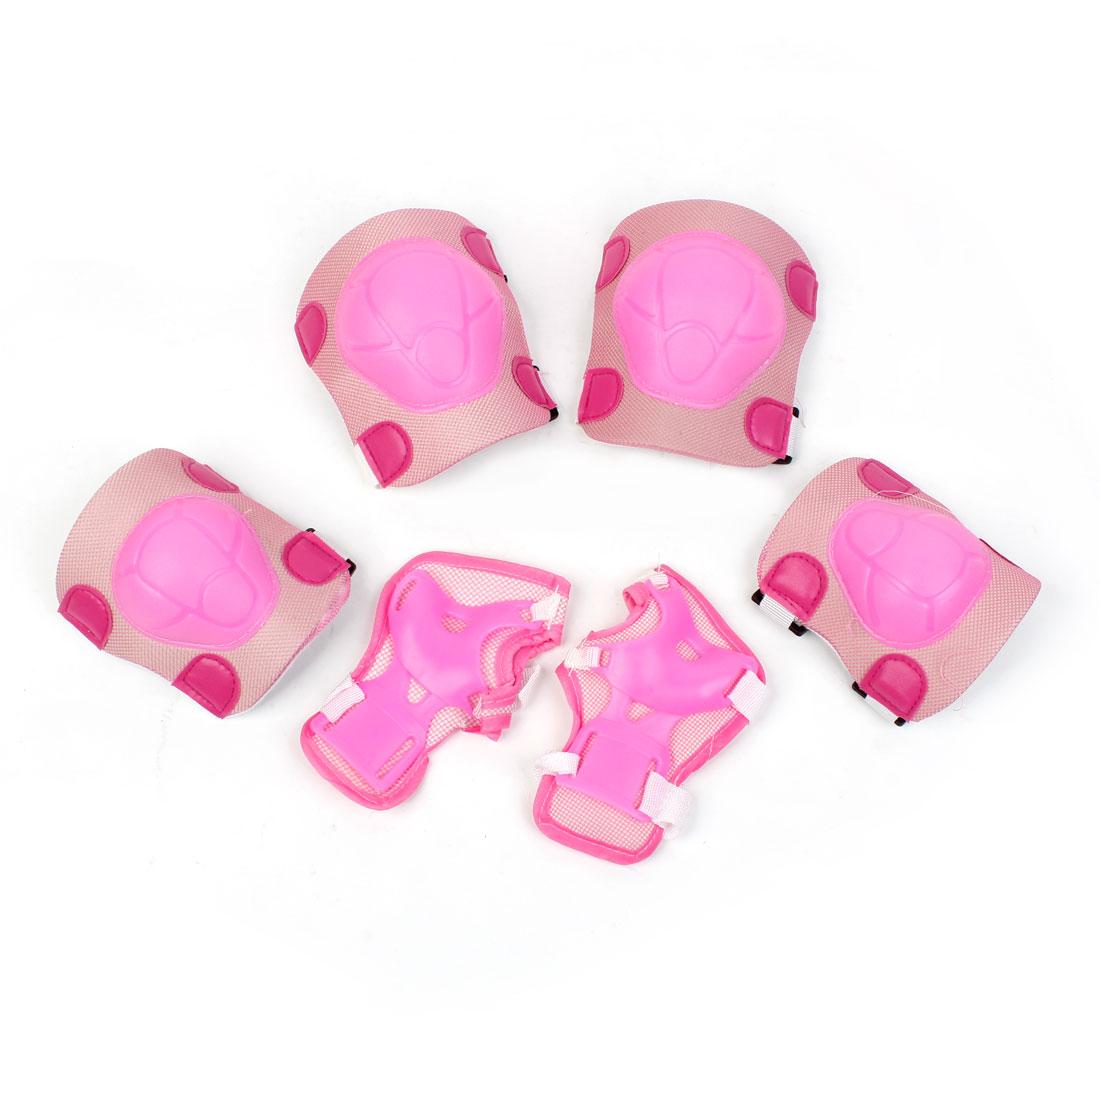 Children Pink Wrist Knee Elbow Support Protector Set